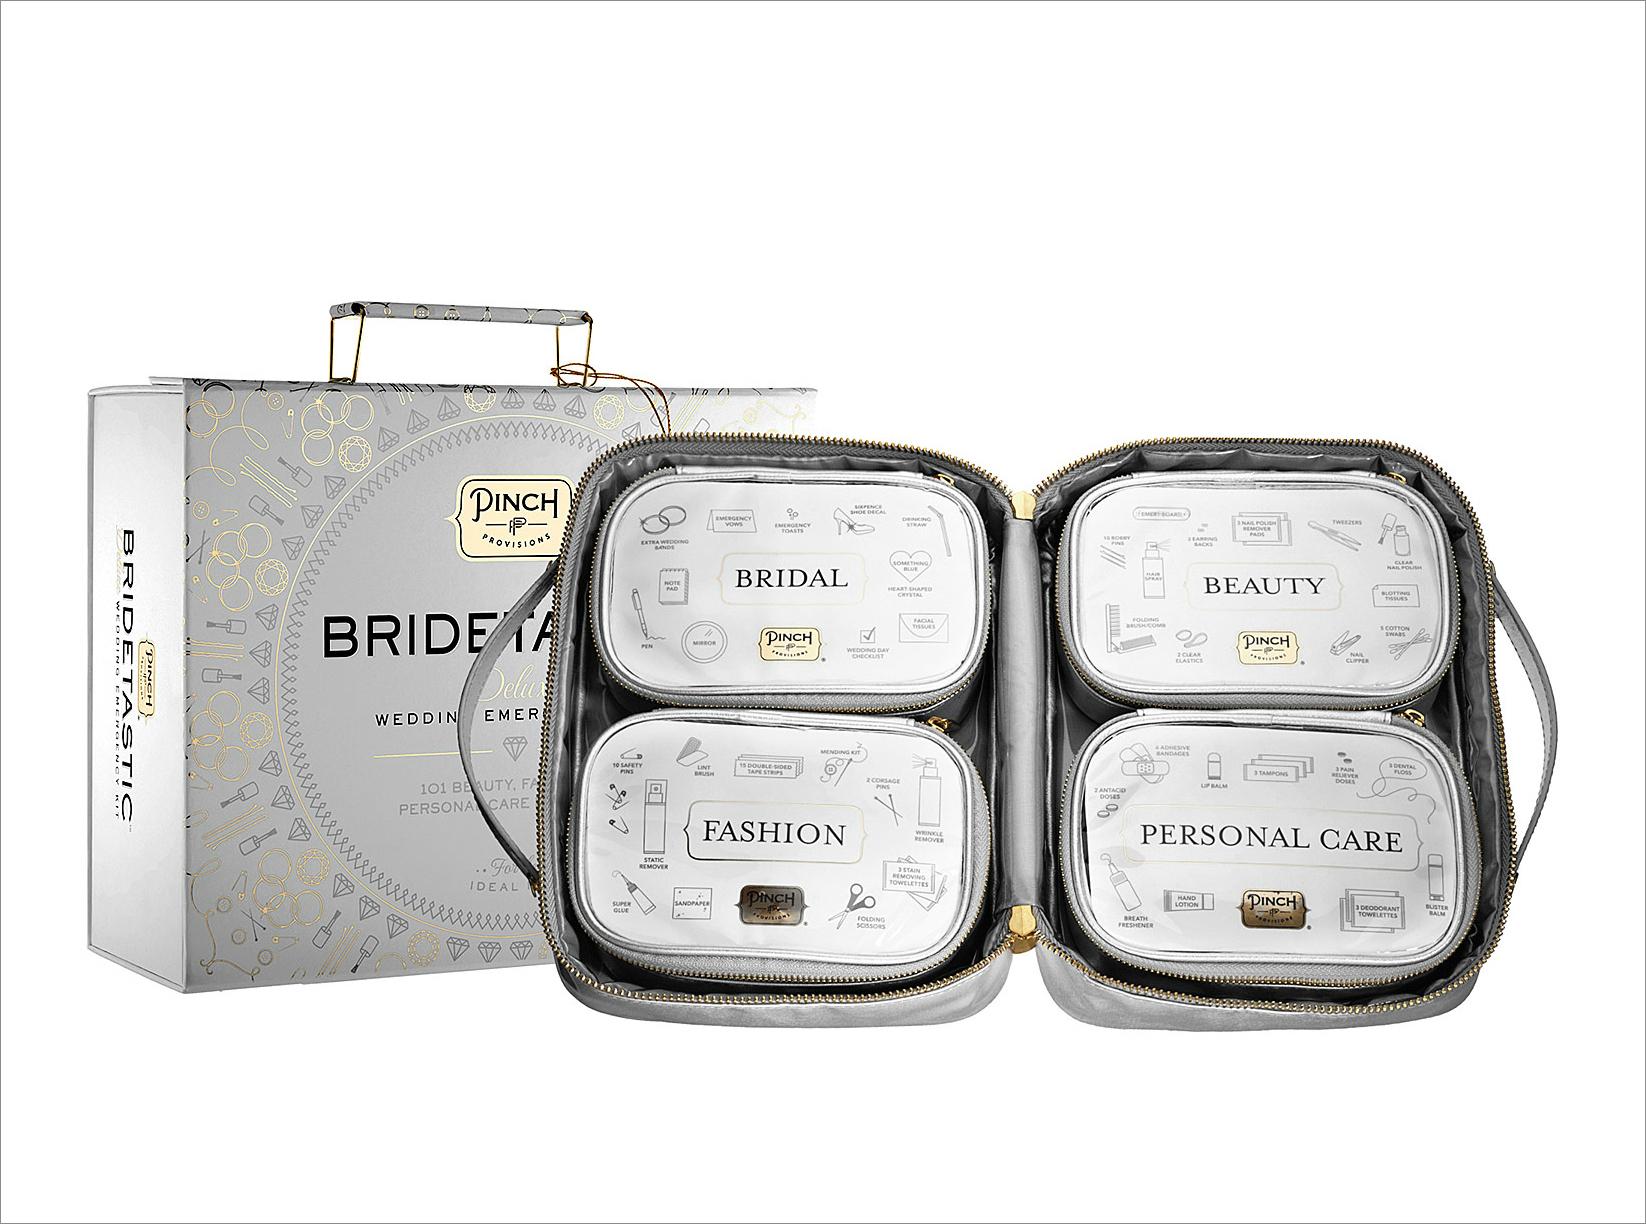 Bridetastic wedding day emergency kit